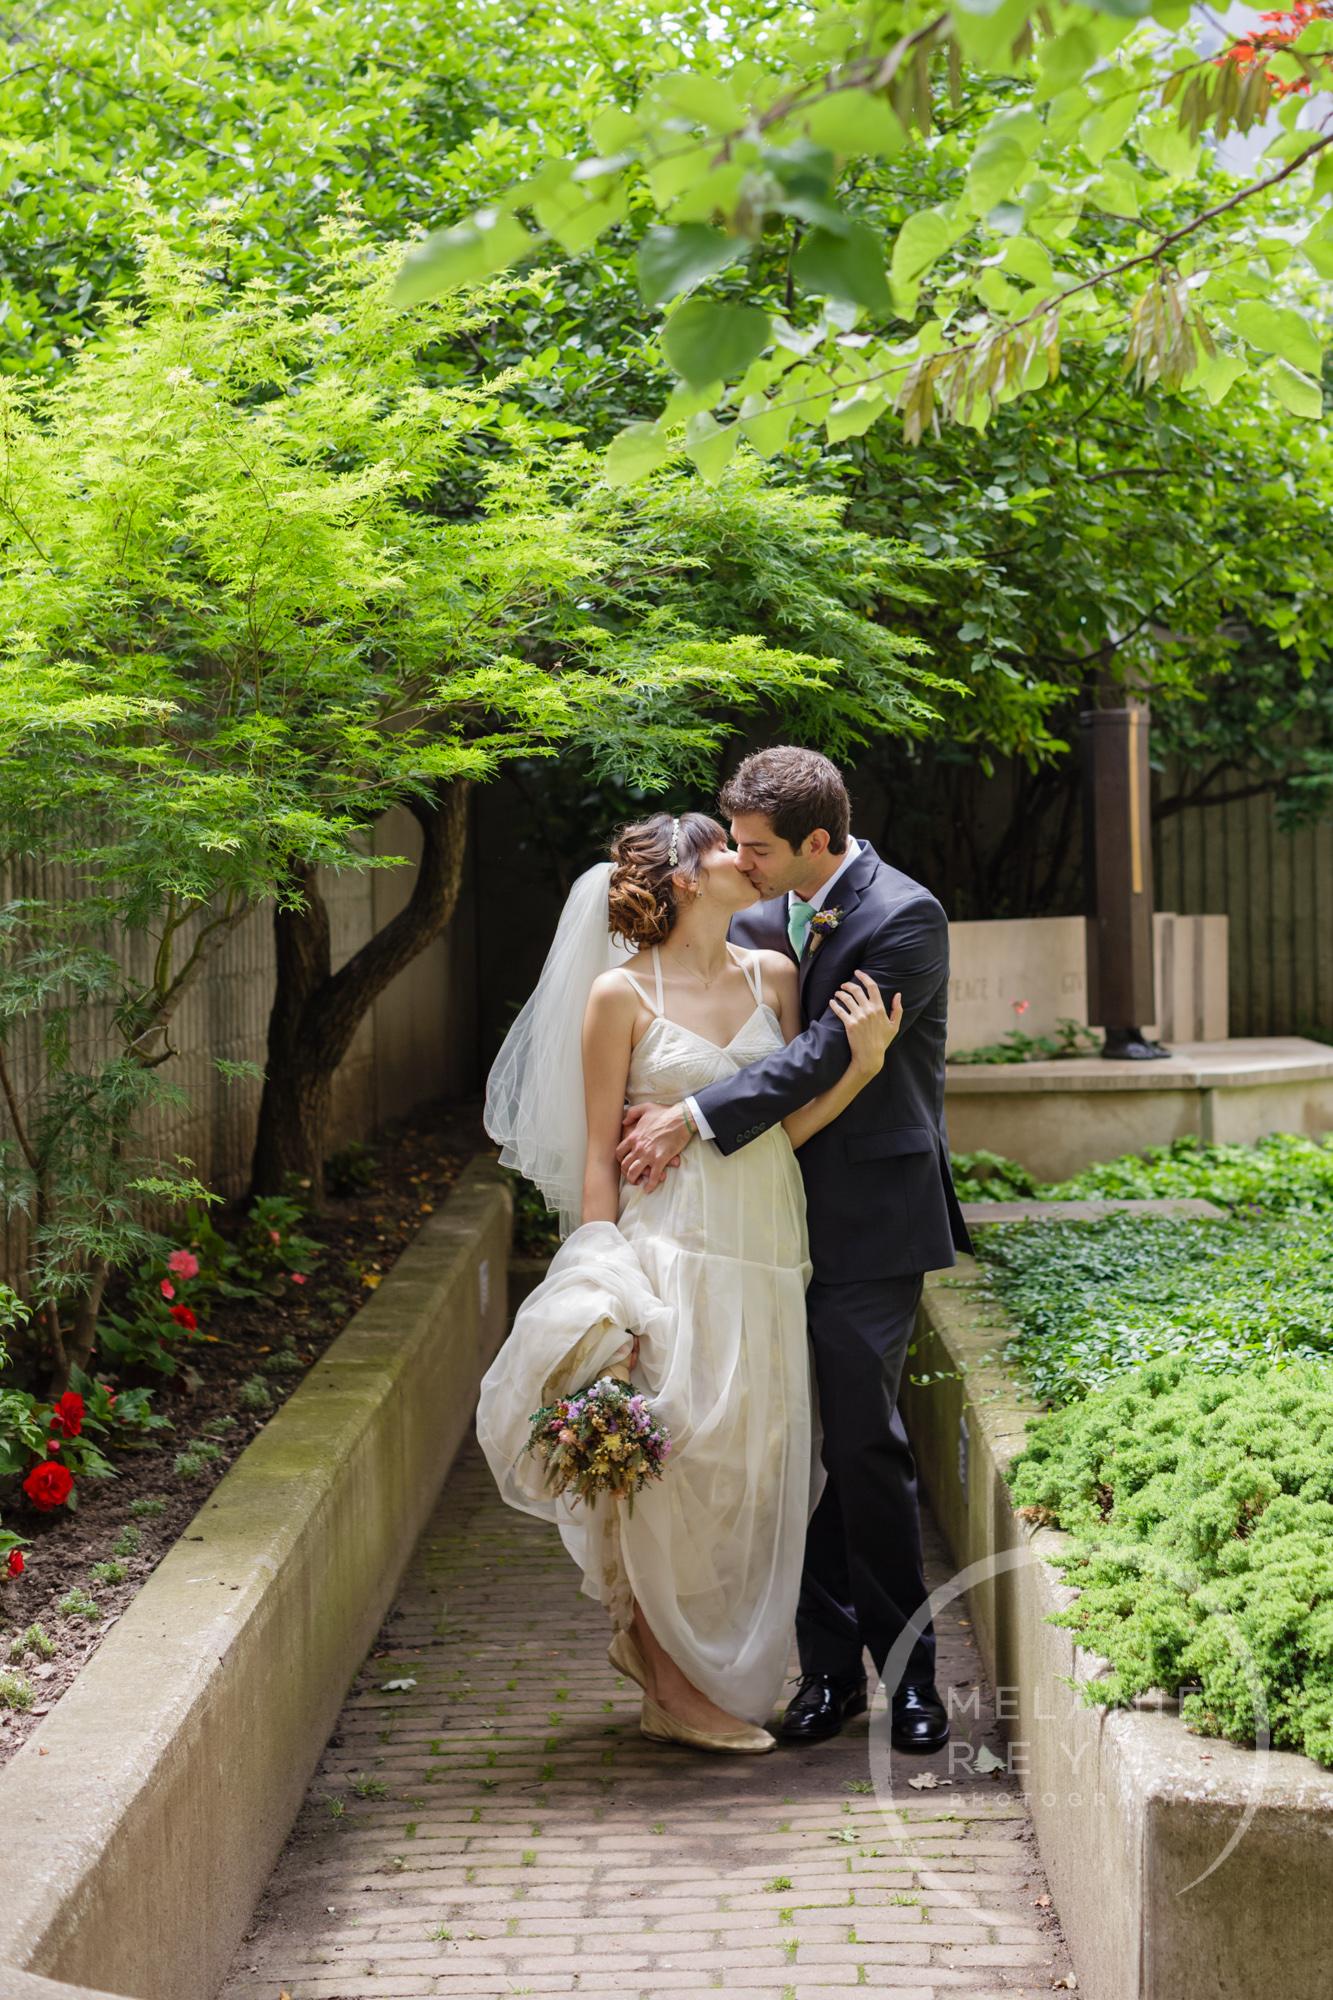 carlylewie_annarbor_wedding_-15.jpg